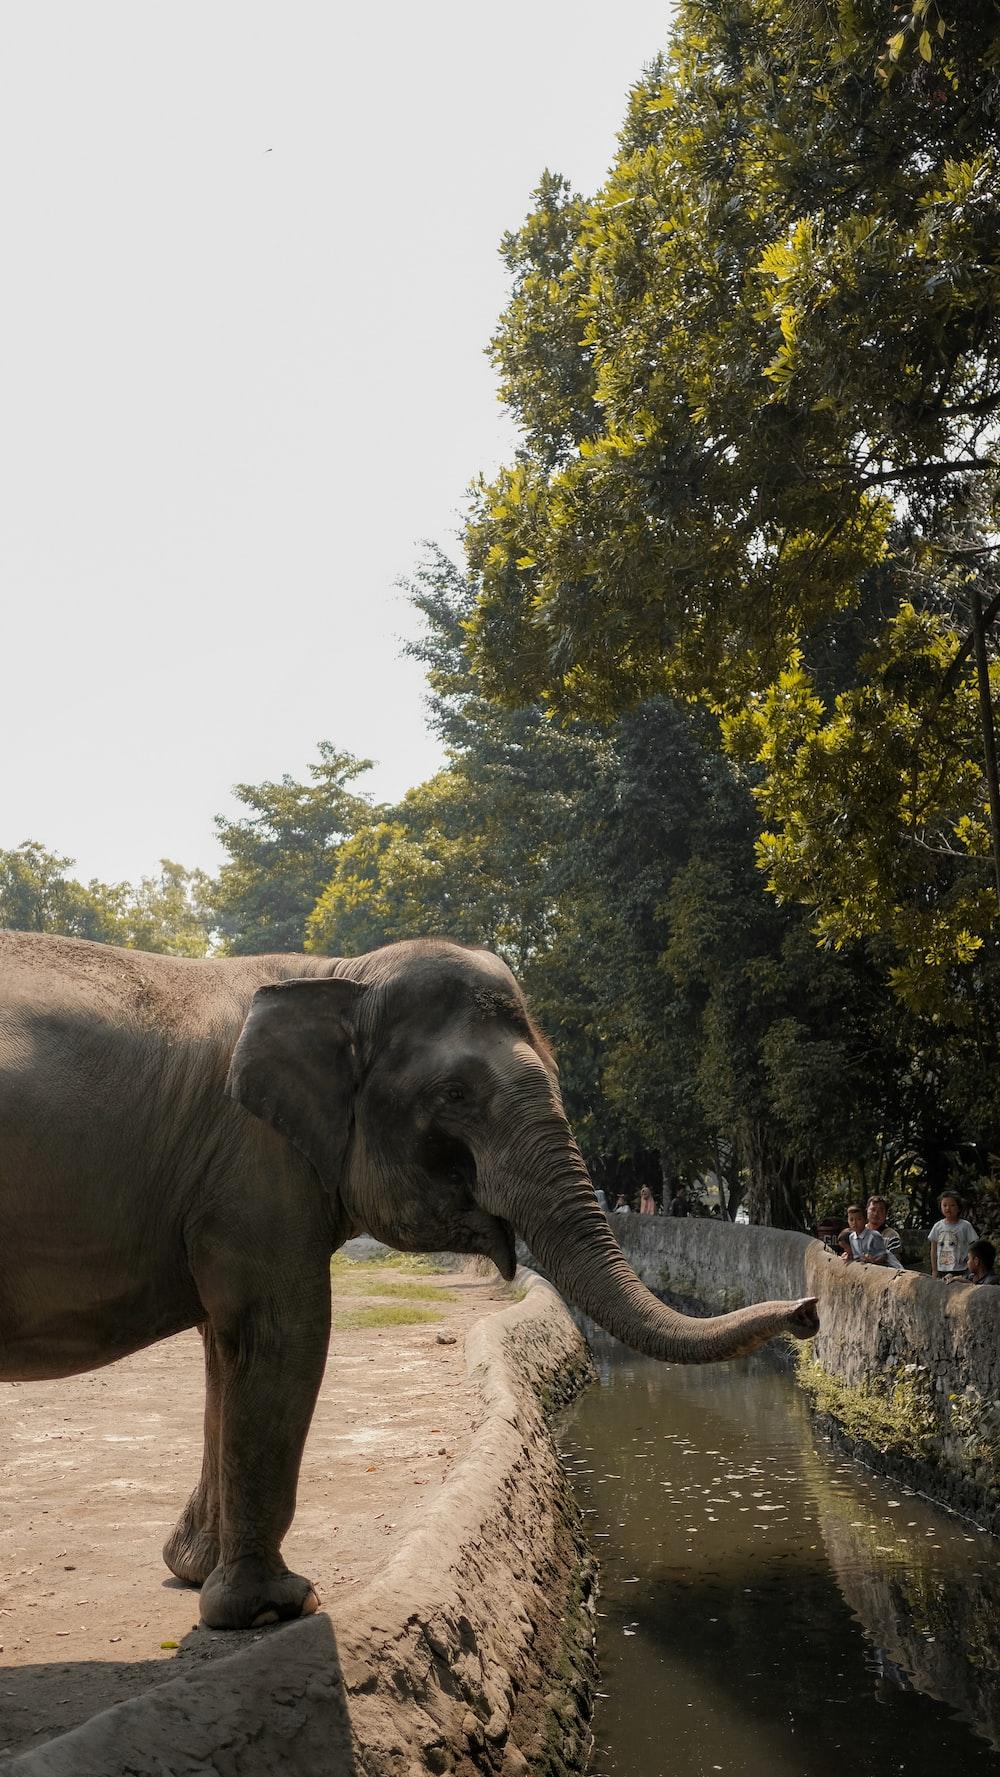 brown elephant across green trees